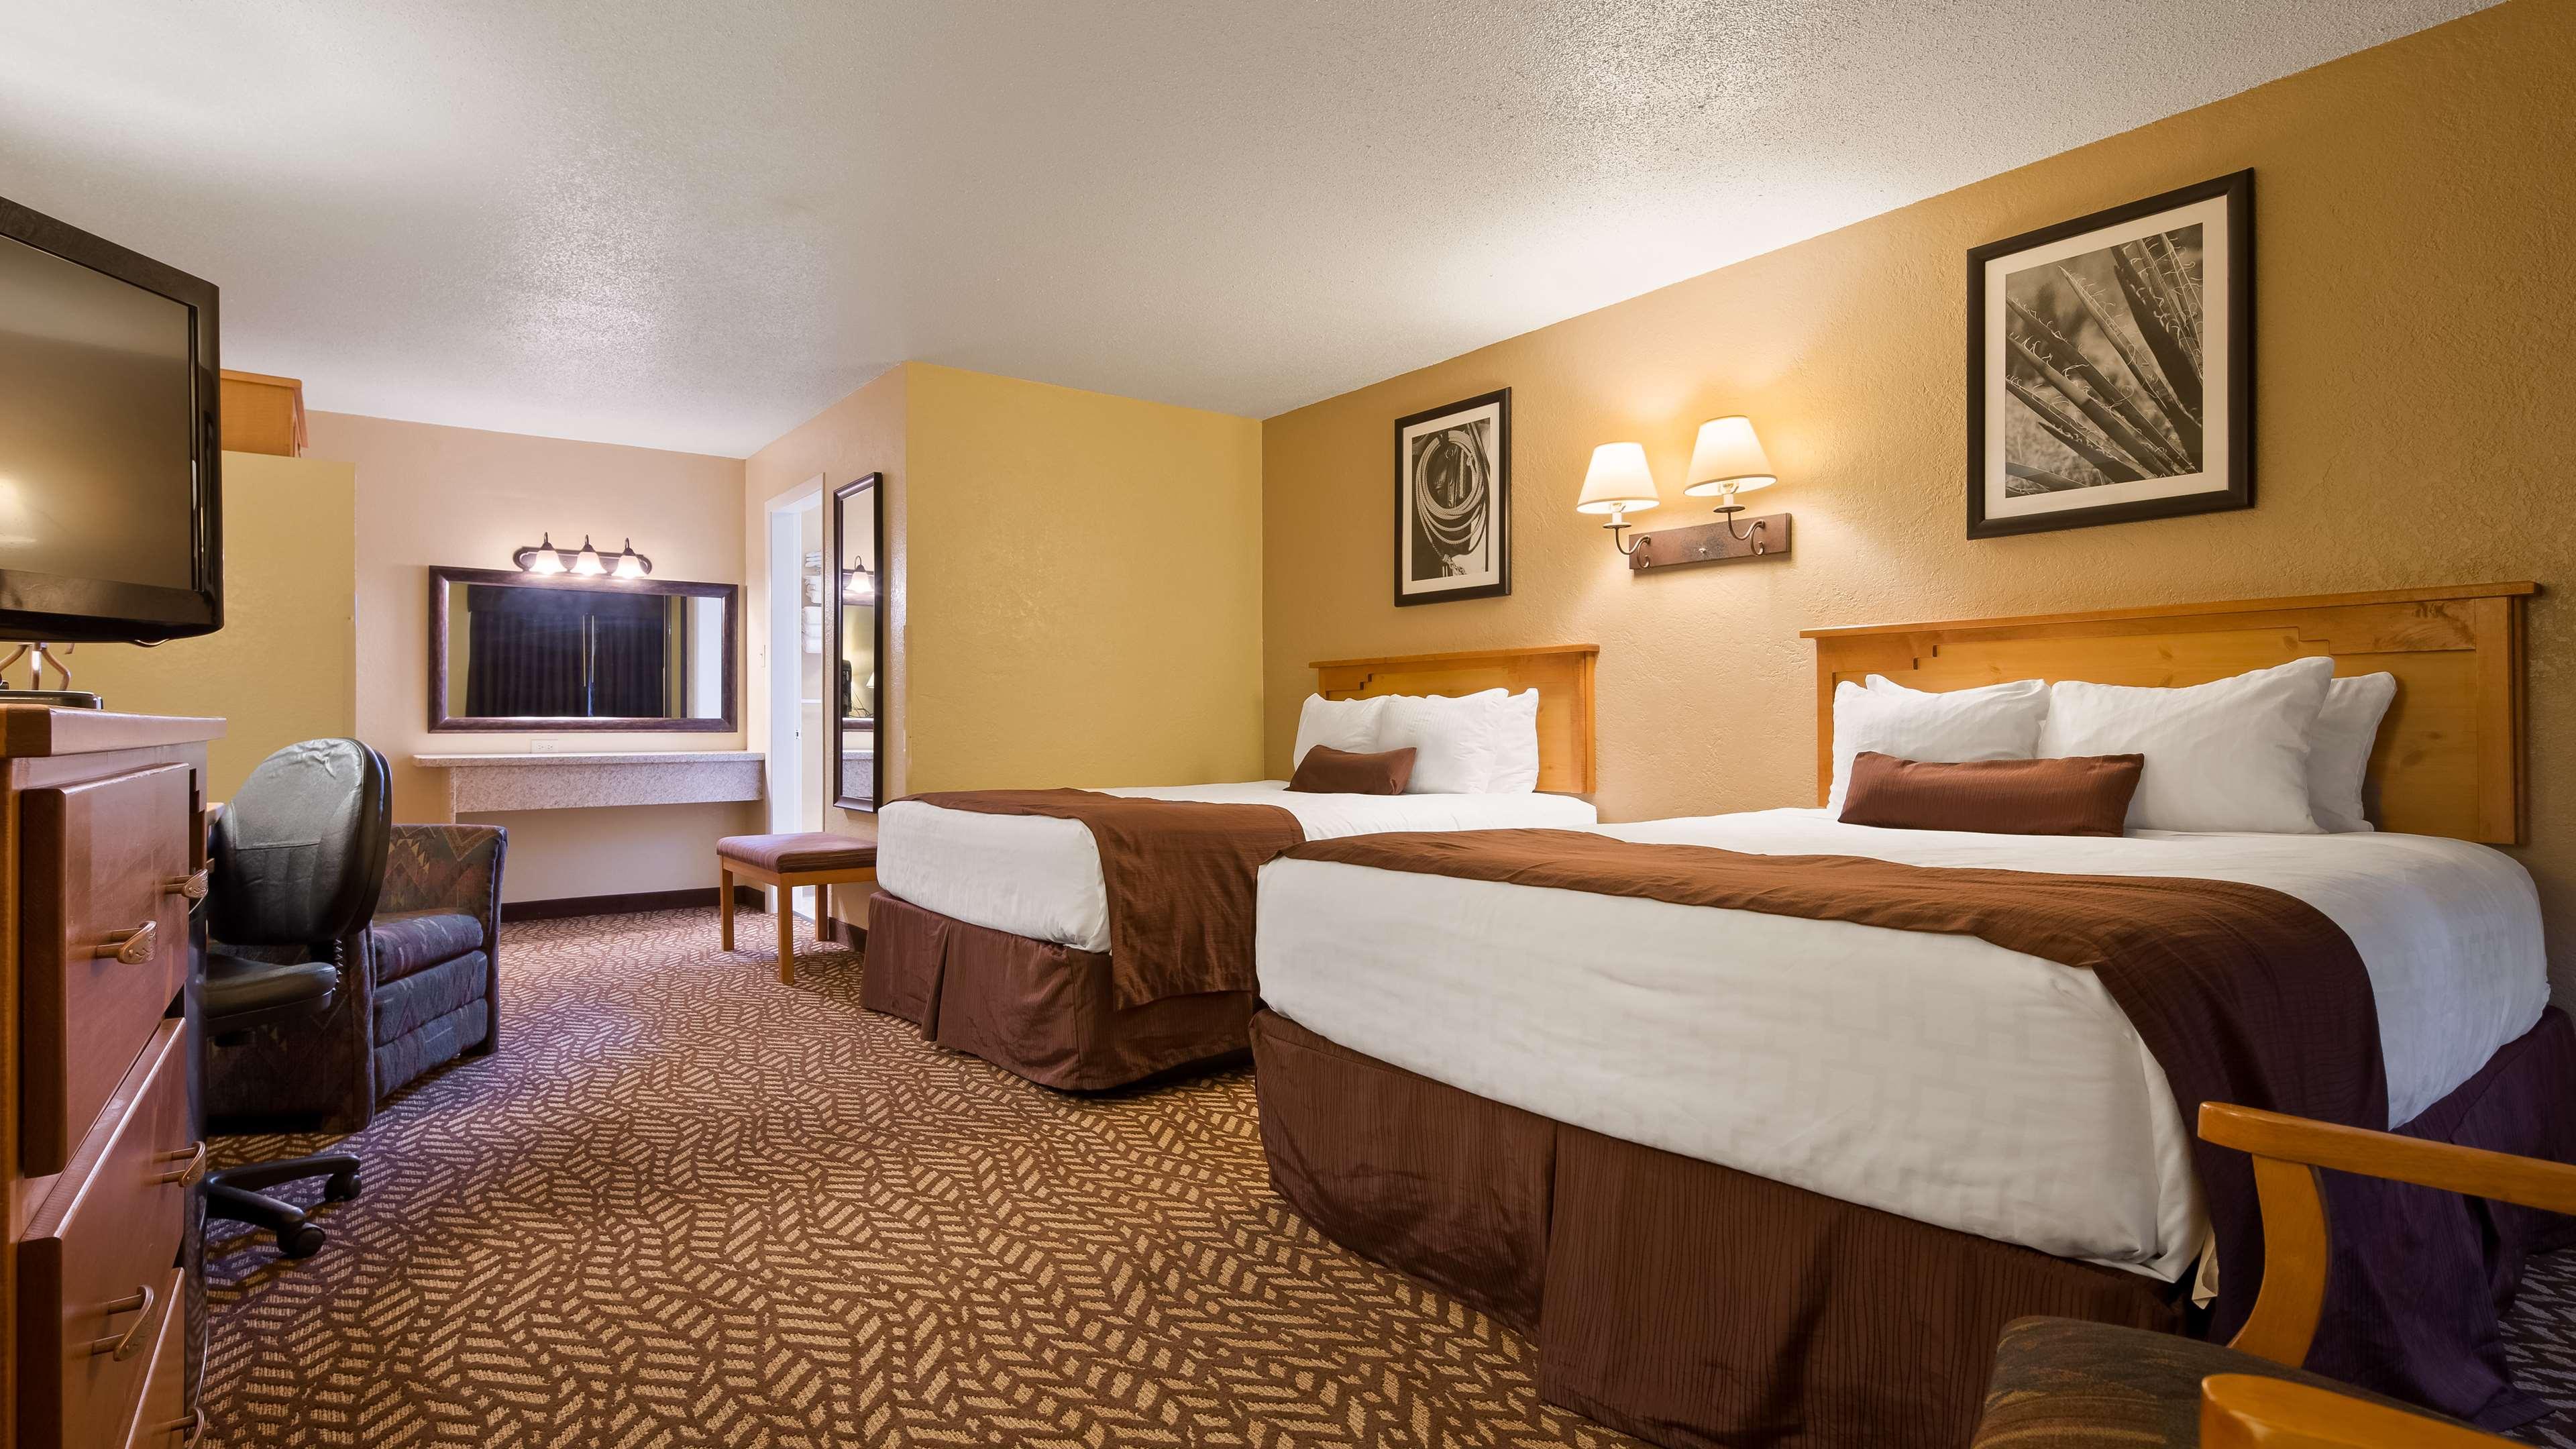 Best Western Turquoise Inn & Suites image 17